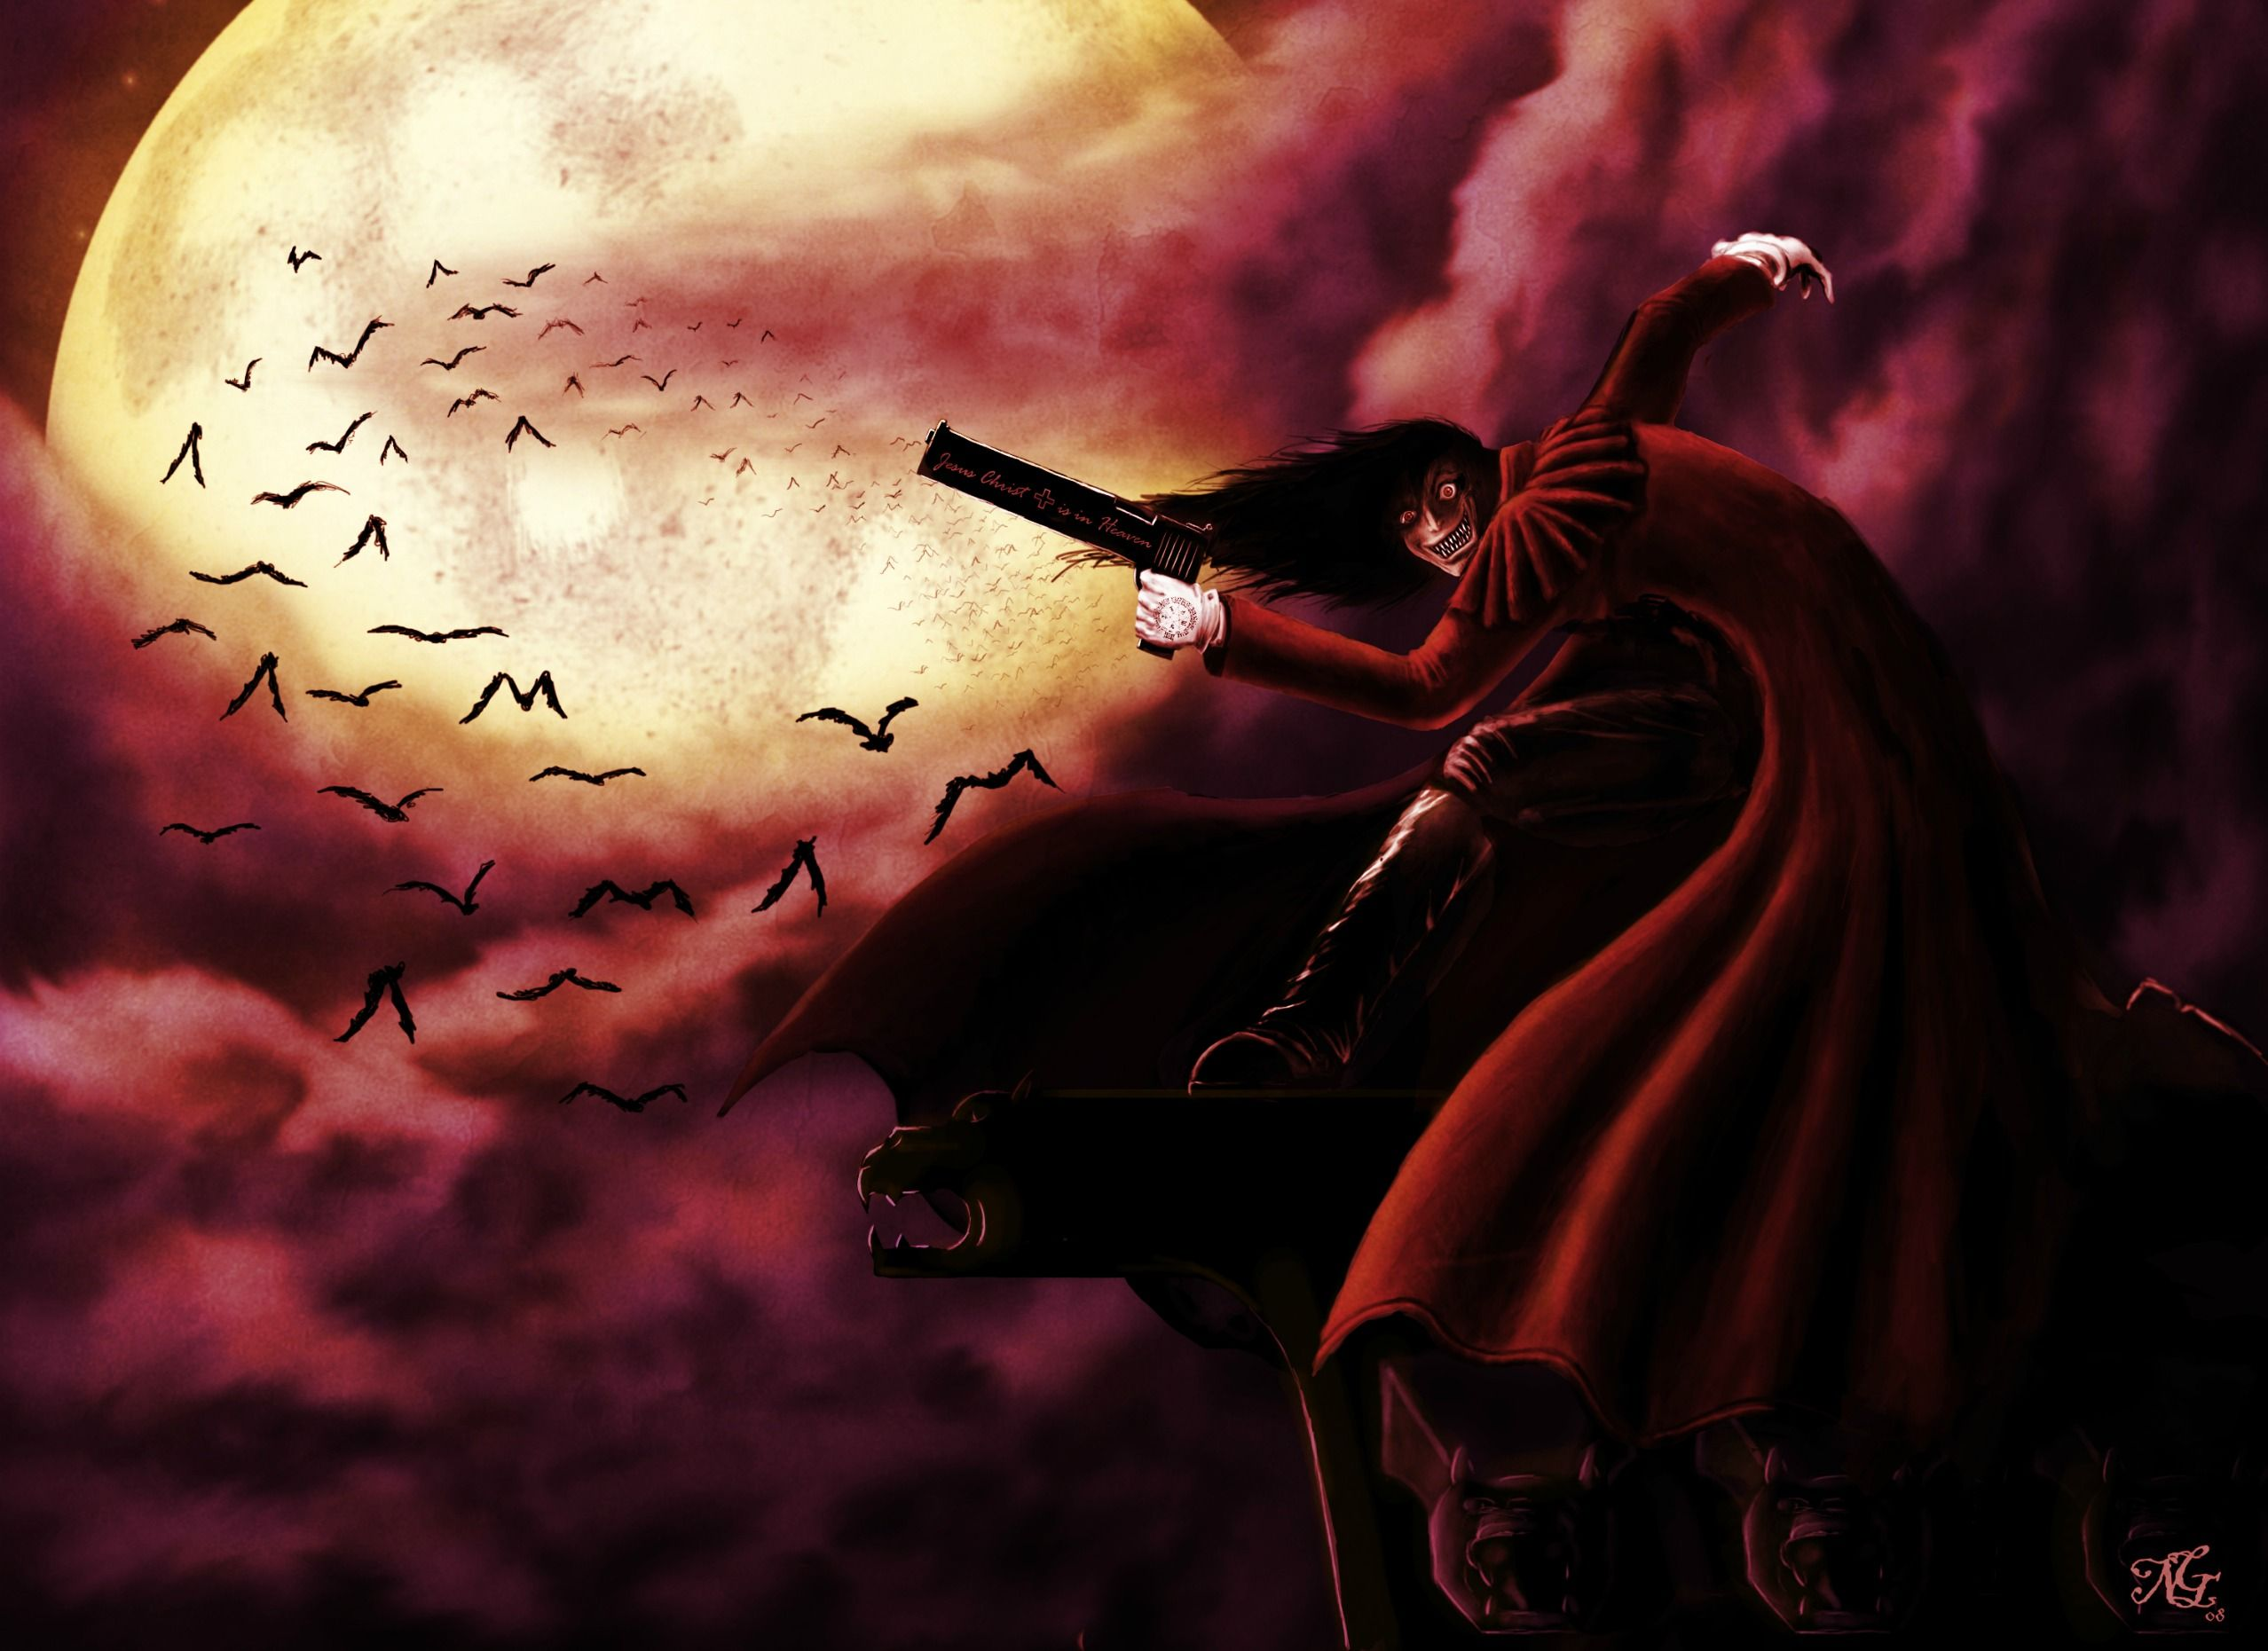 Hellsing Ultimate, Alucard, I belong to the night